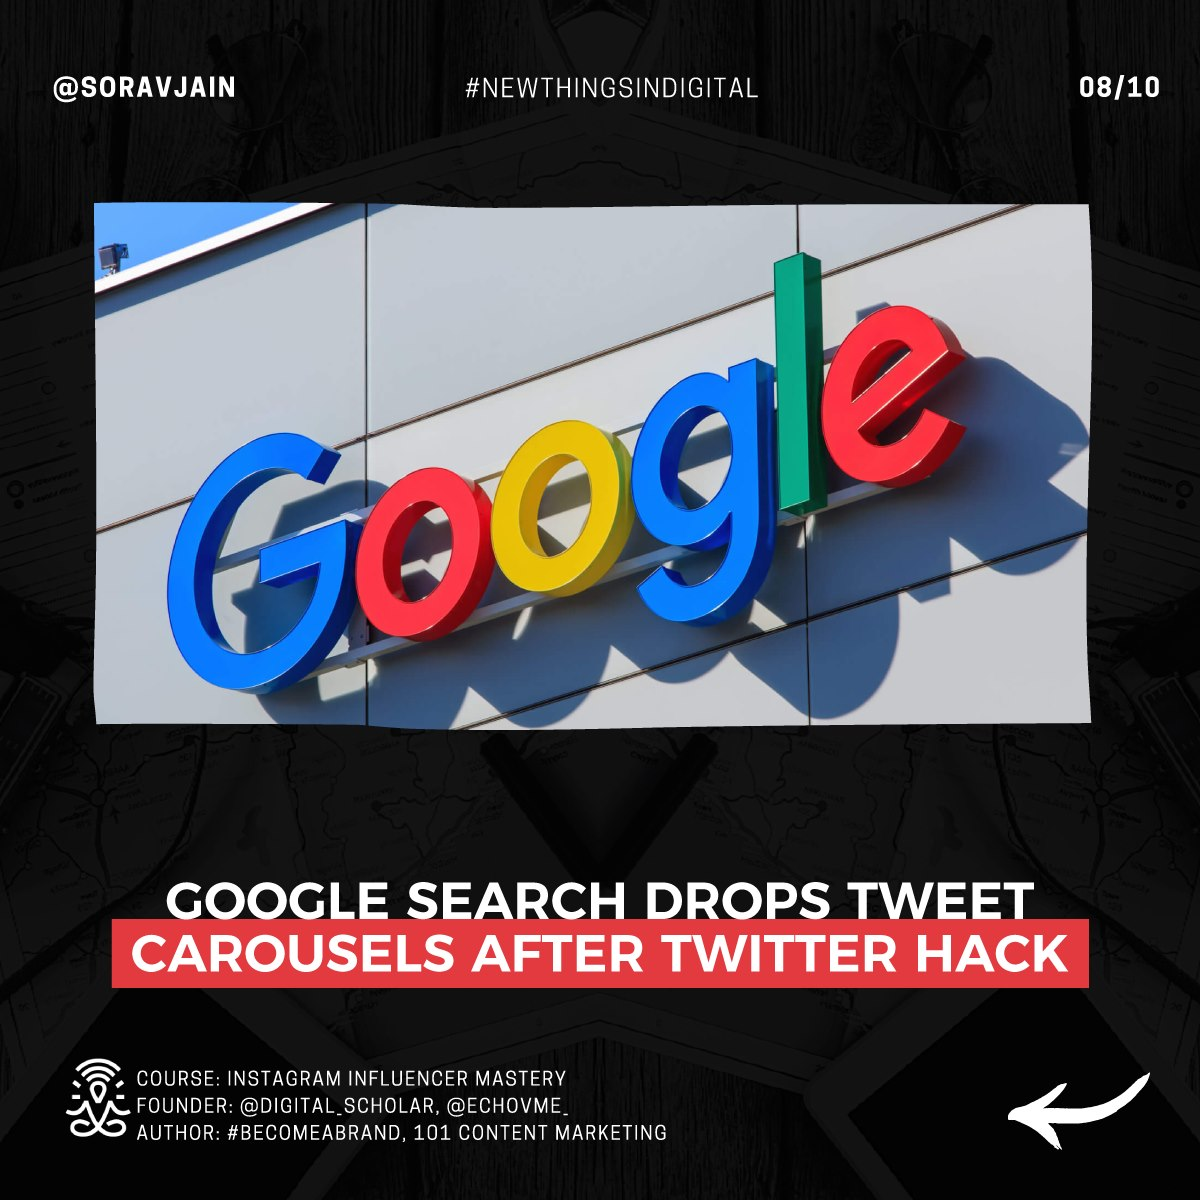 Google Search drops tweet carousels after Twitter hack